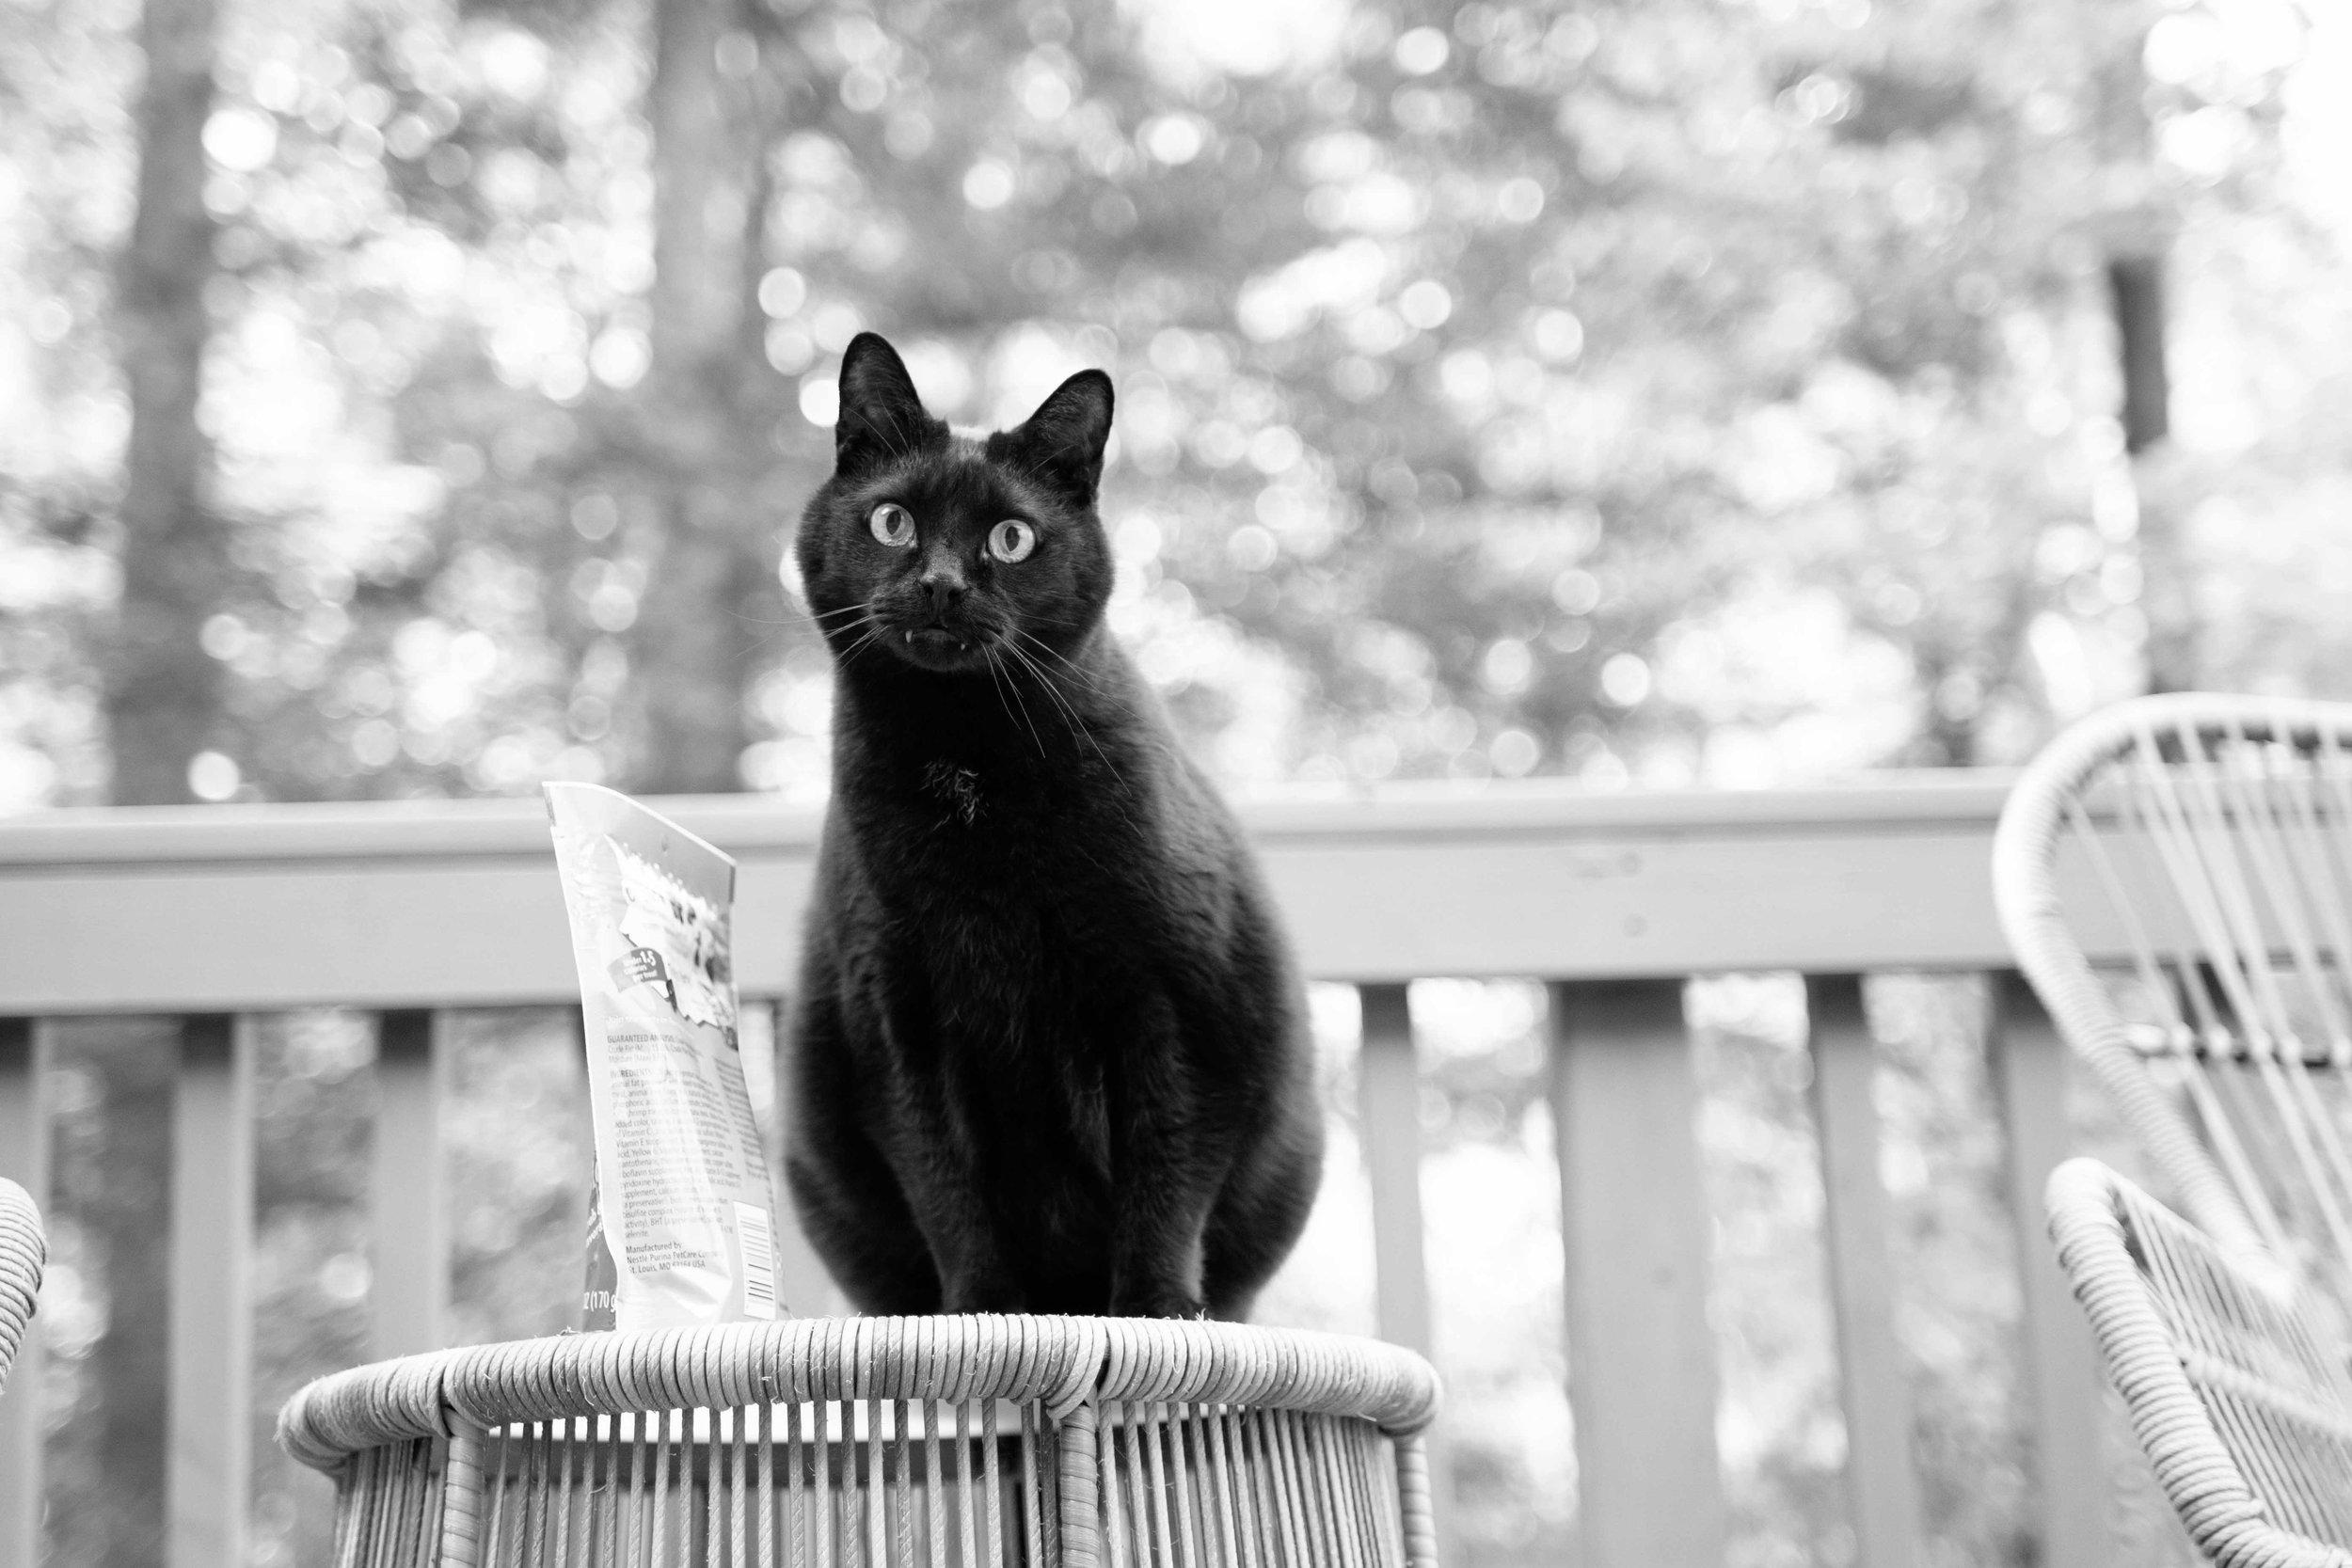 Arlington_Cat_Photographer_10282017_04.jpg